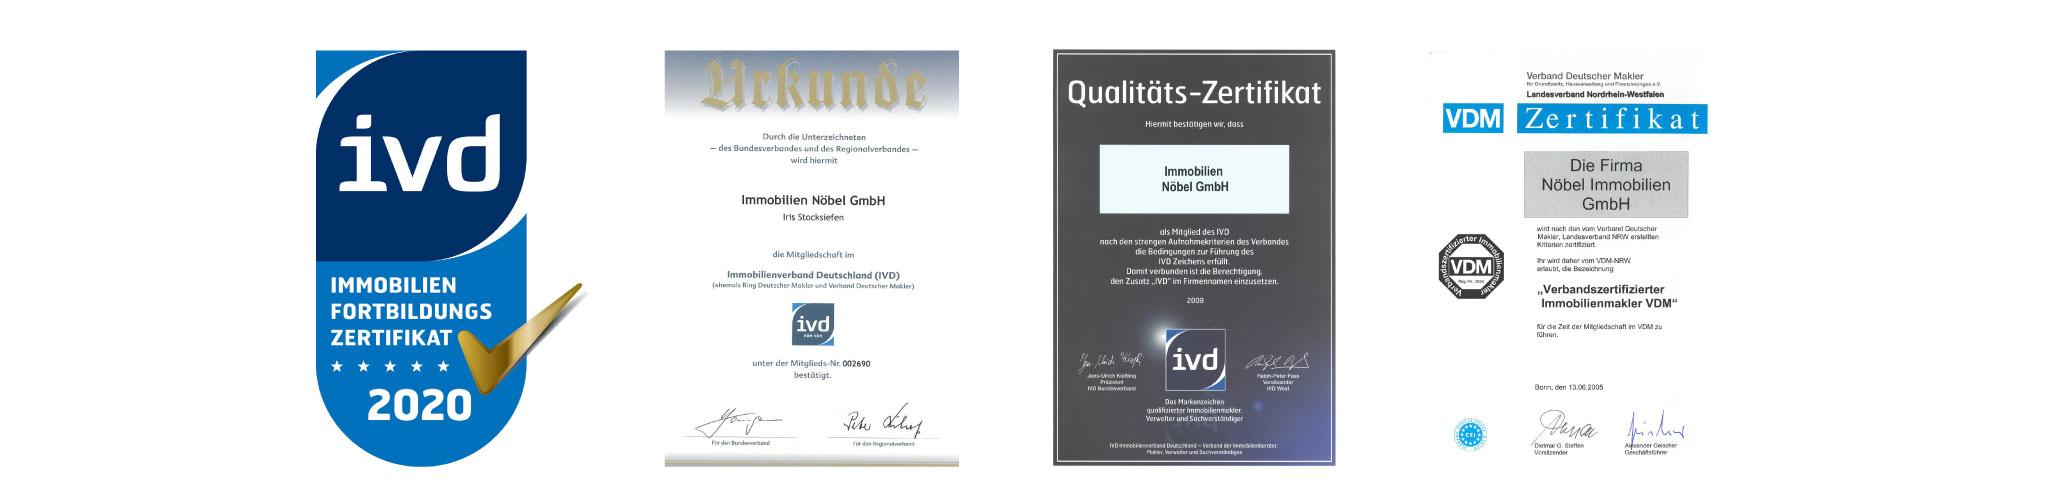 Immobilien Nöbel GmbH - Wir sind Zertifiziert